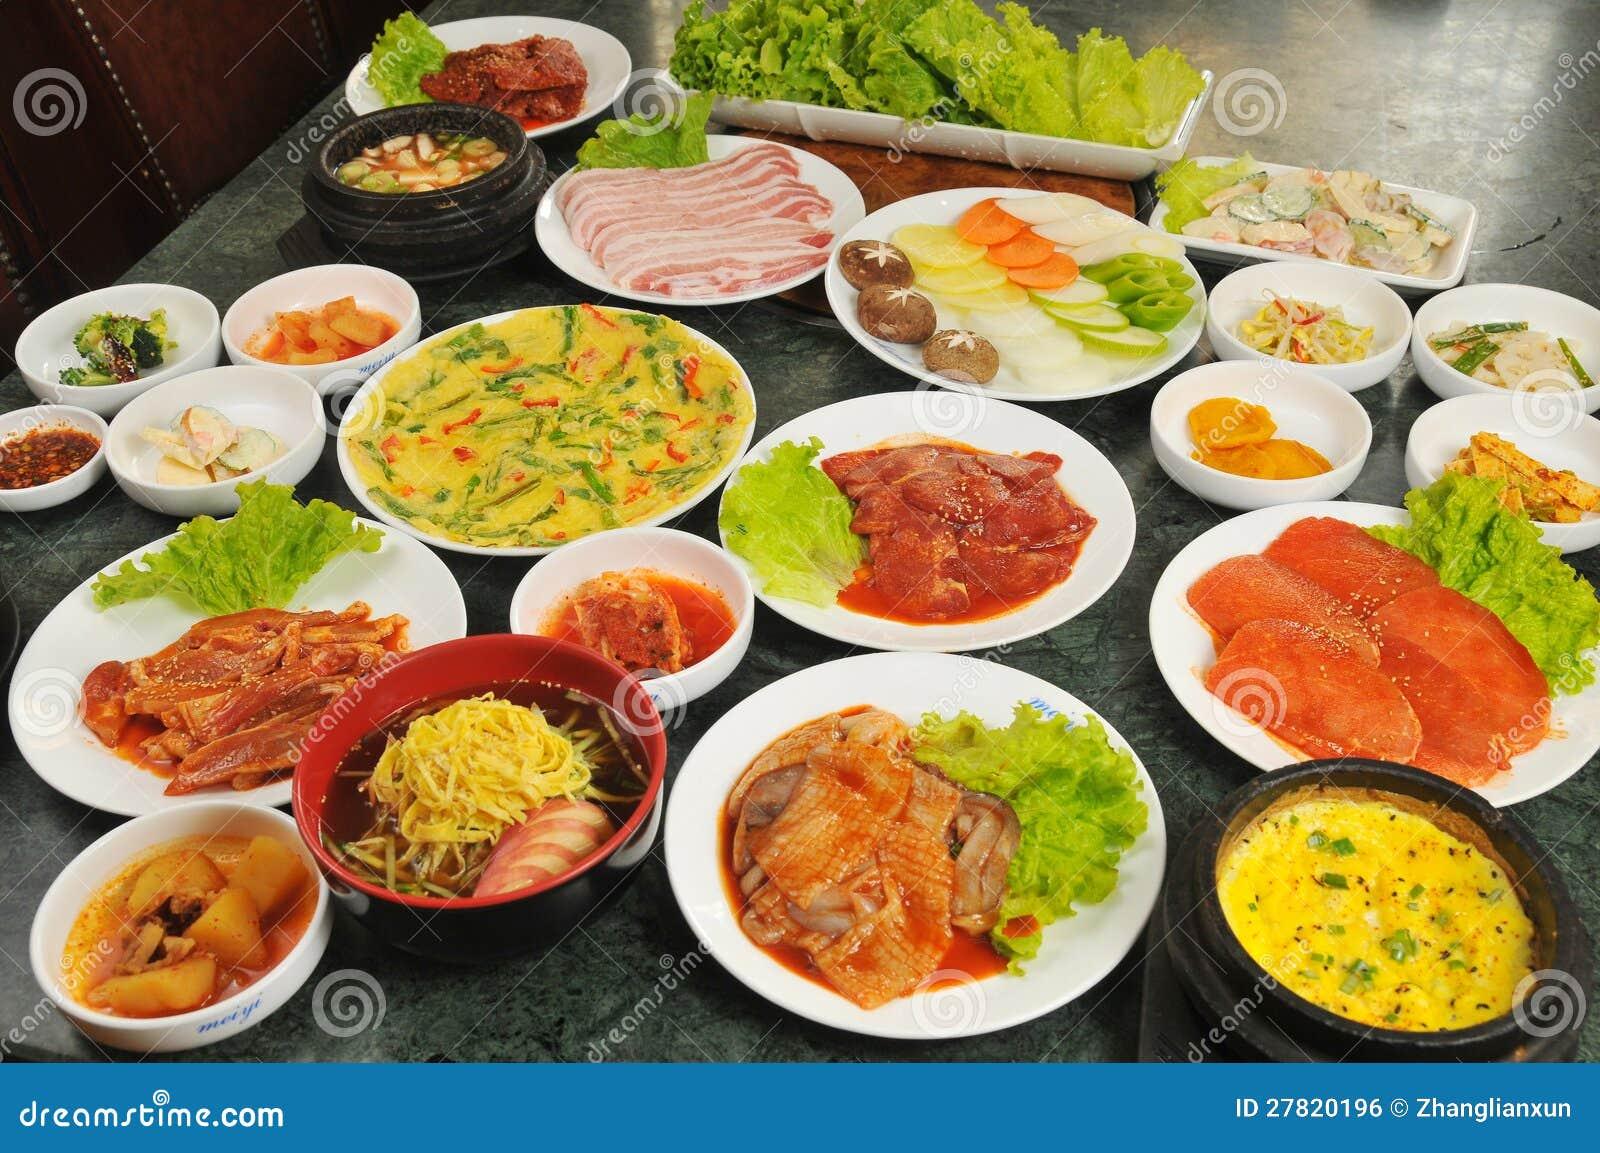 koreanische küche lizenzfreies stockbild - bild: 27820196